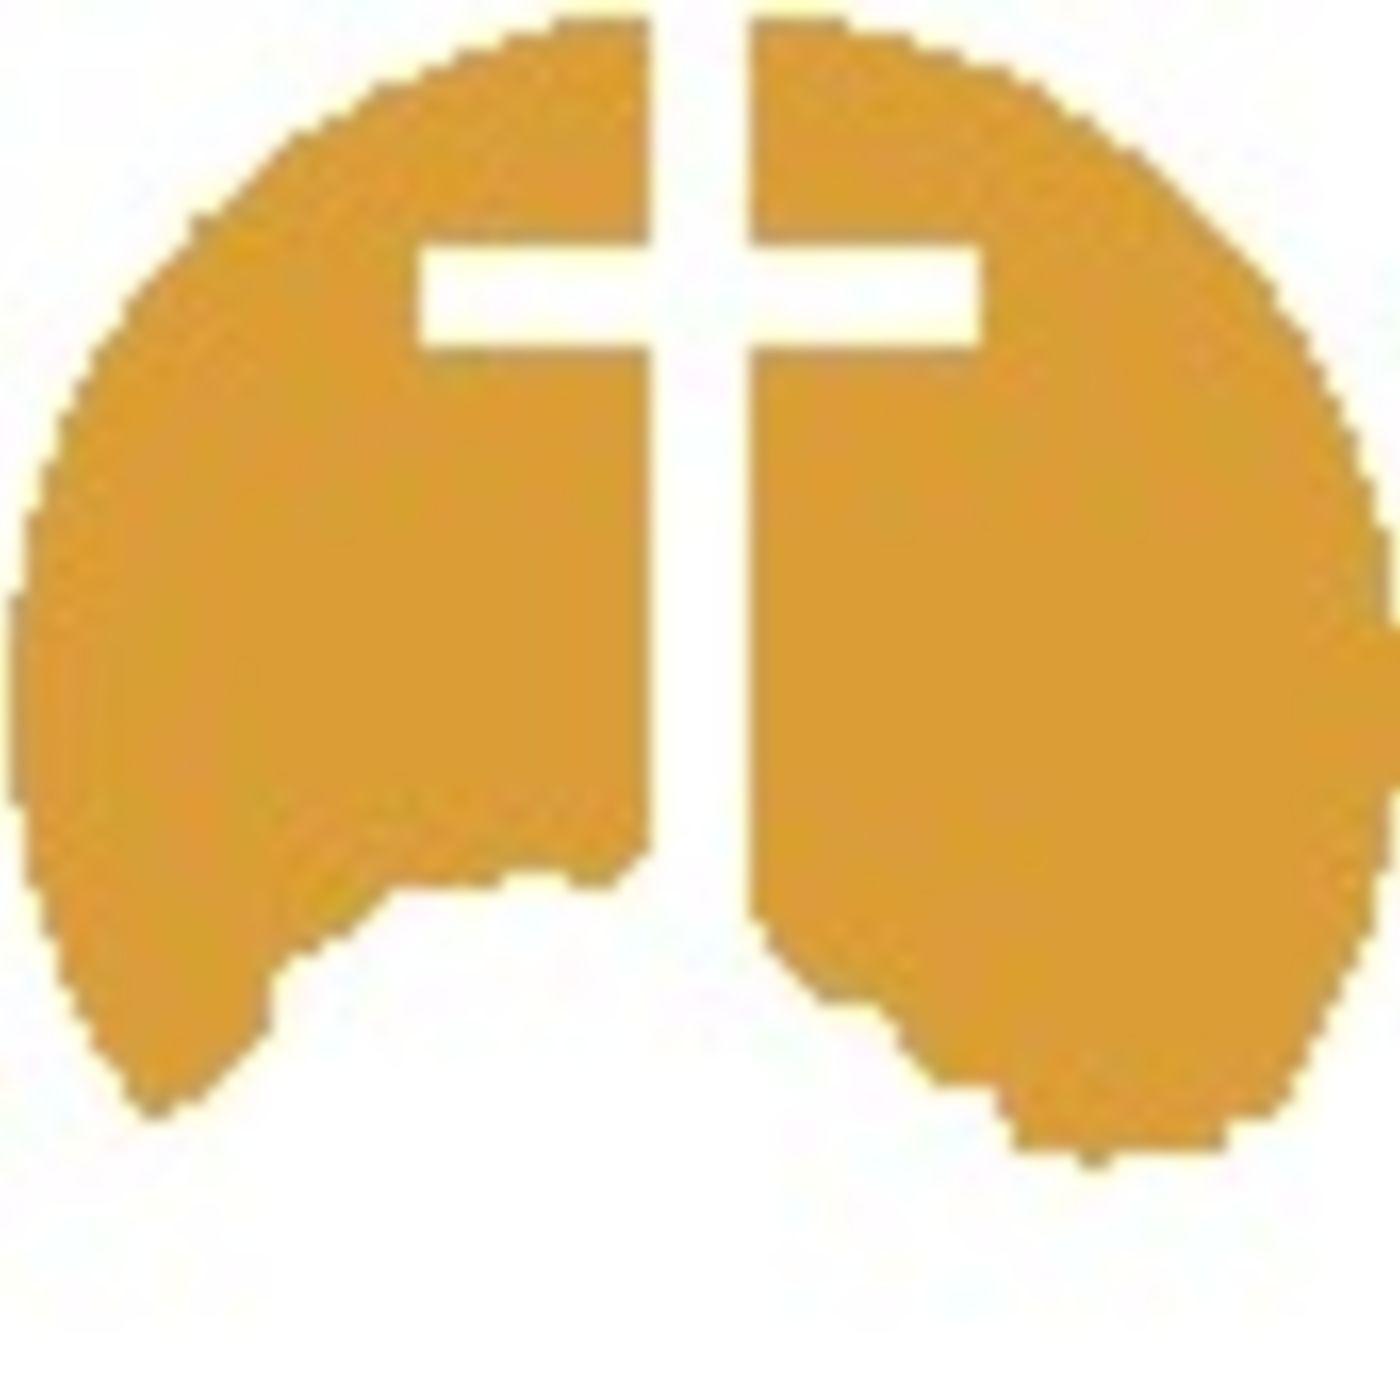 KBC School of Theology - The Trinity, Part 2